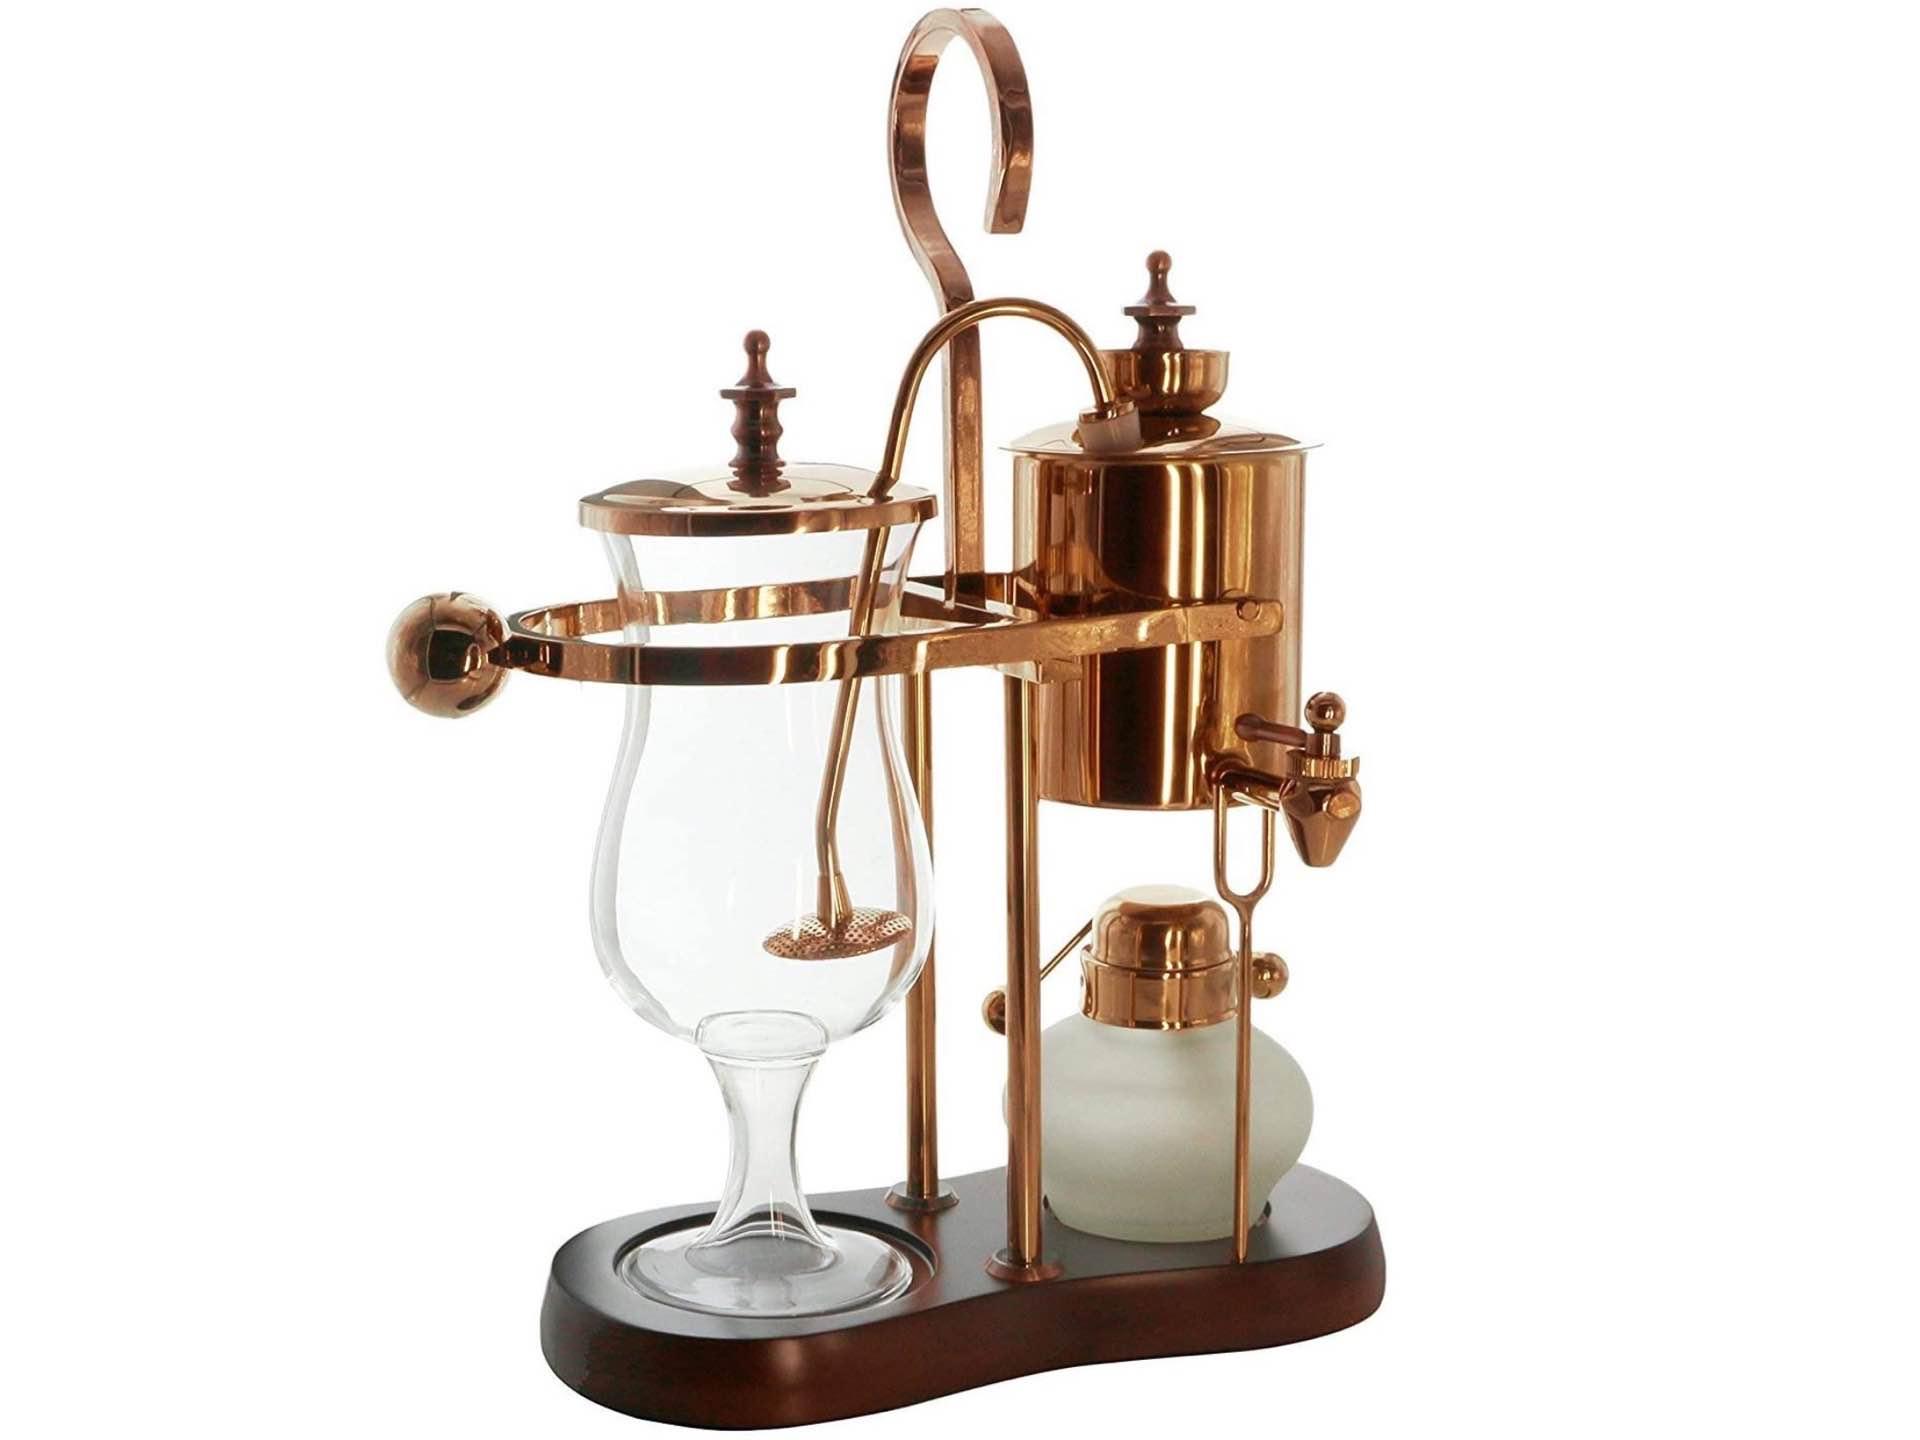 diguo-belgian-balance-siphon-coffee-maker